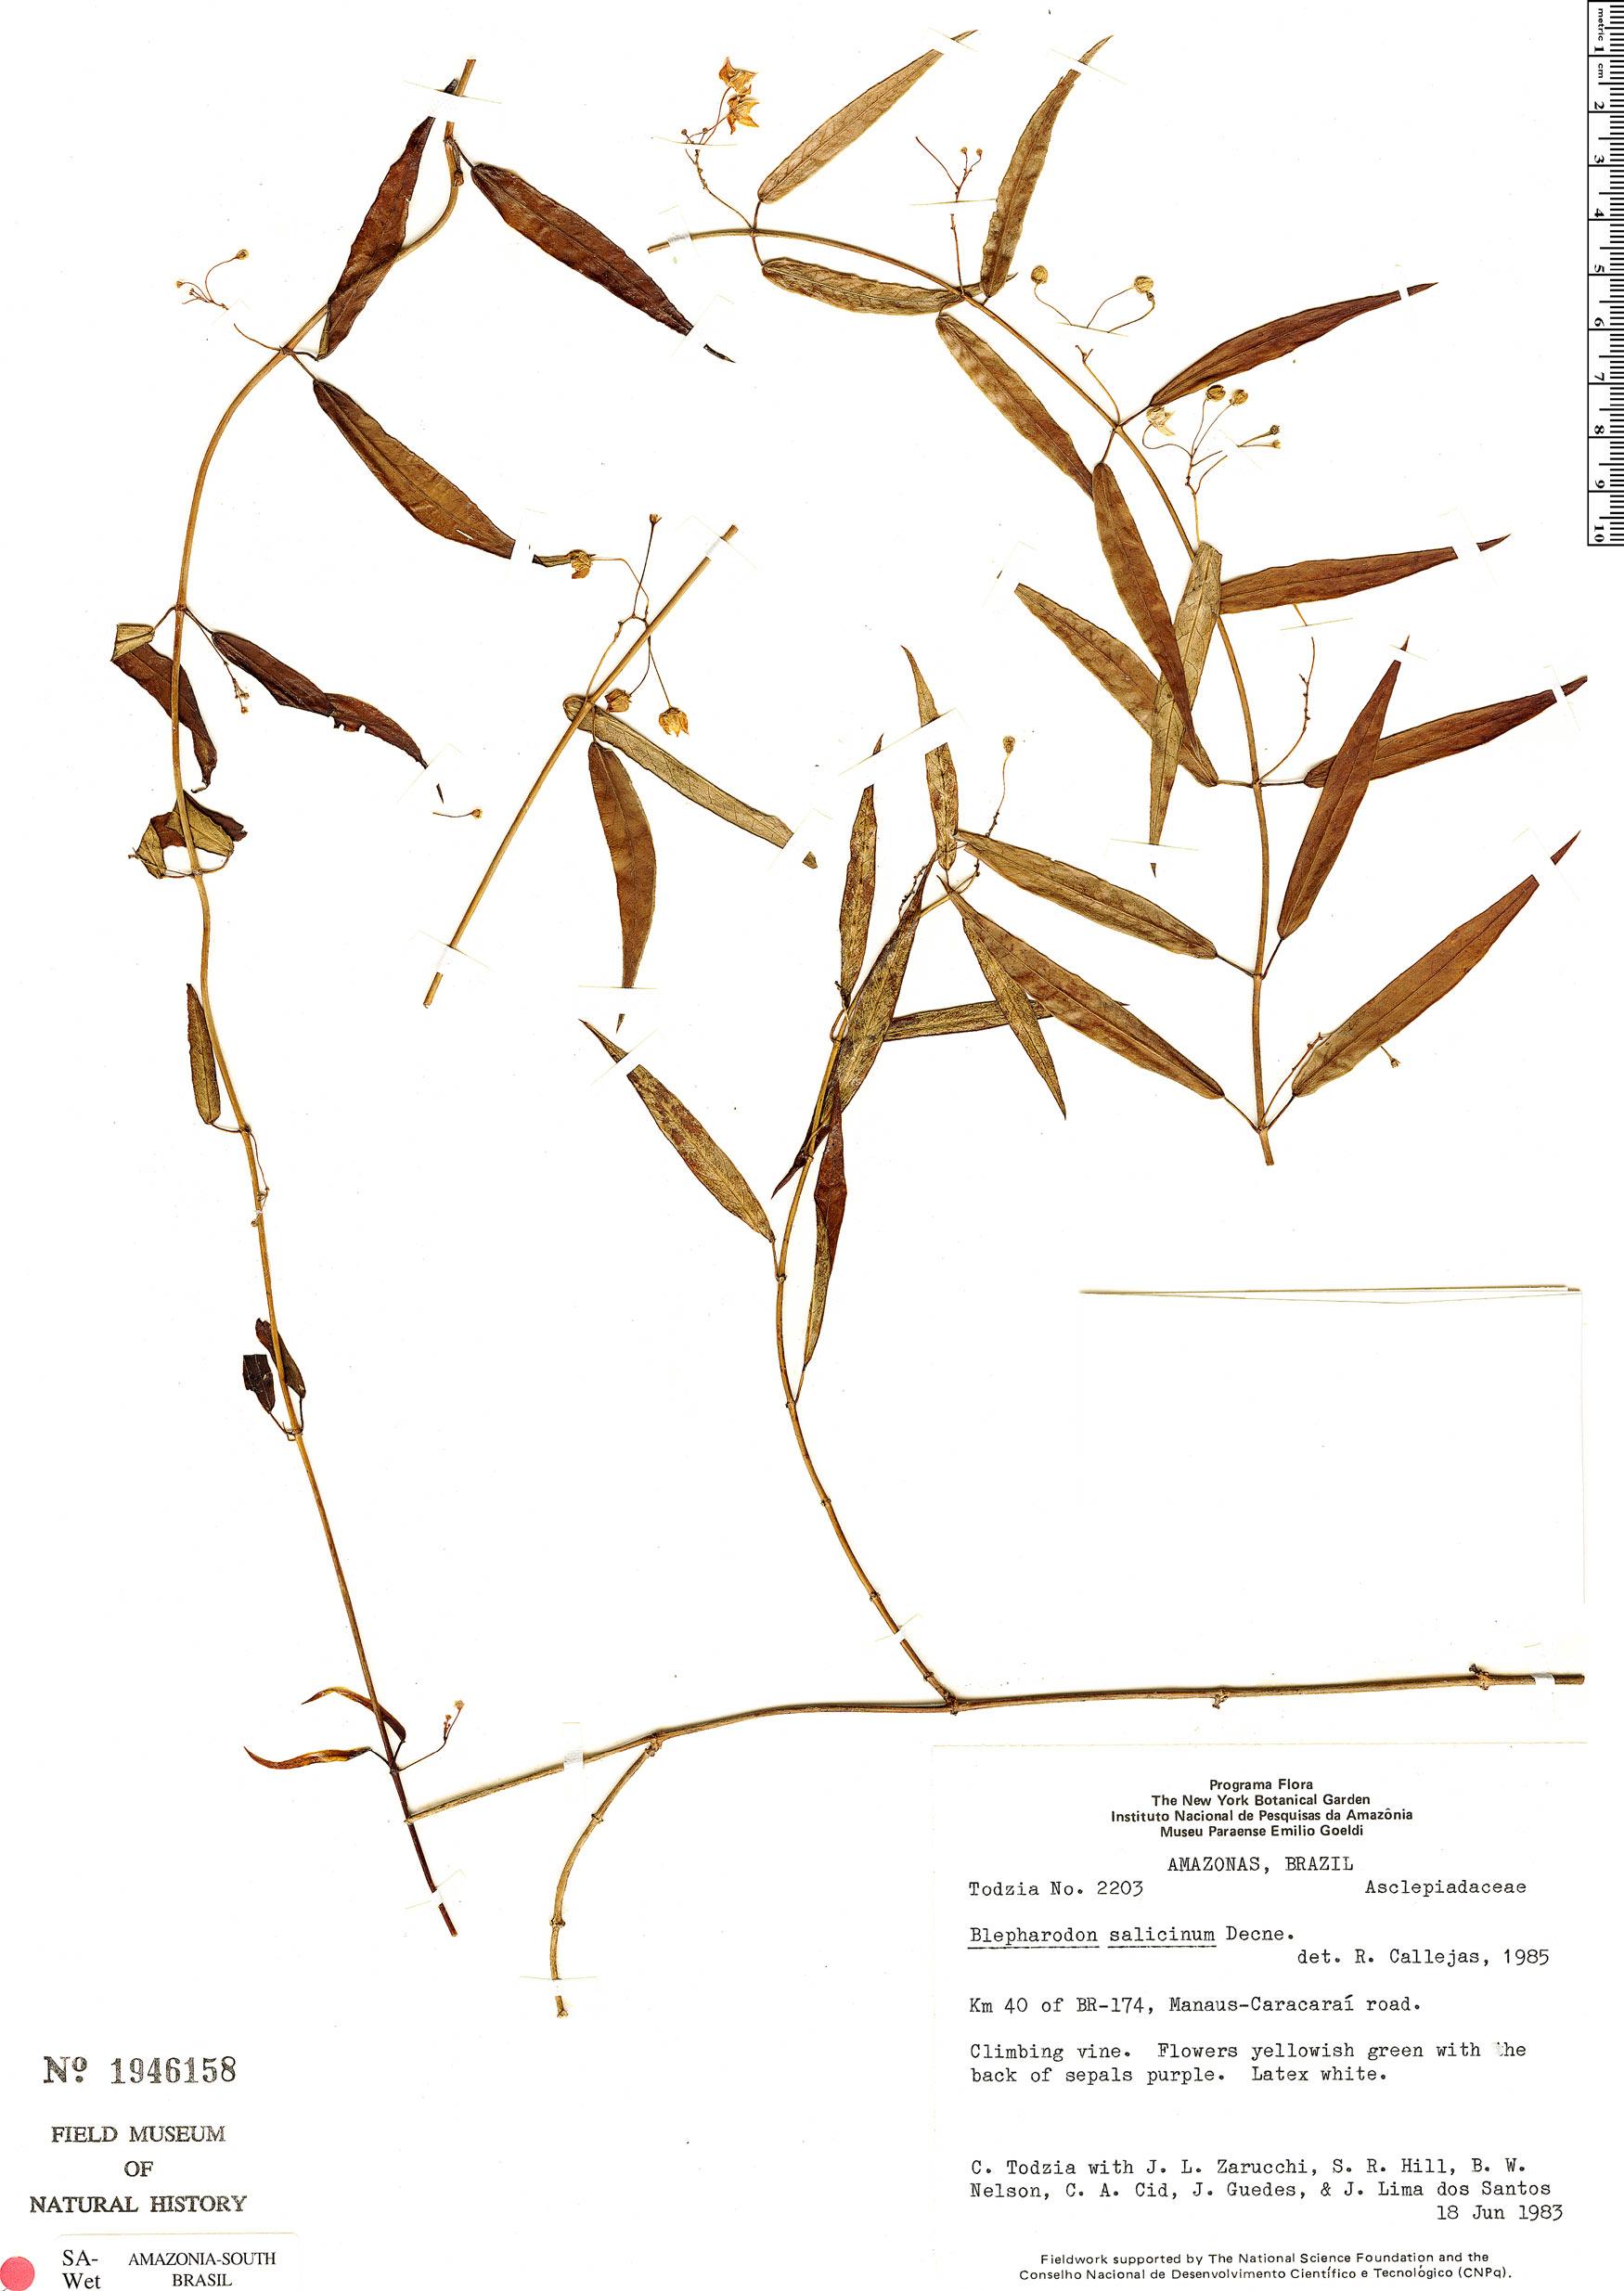 Espécime: Blepharodon salicinum